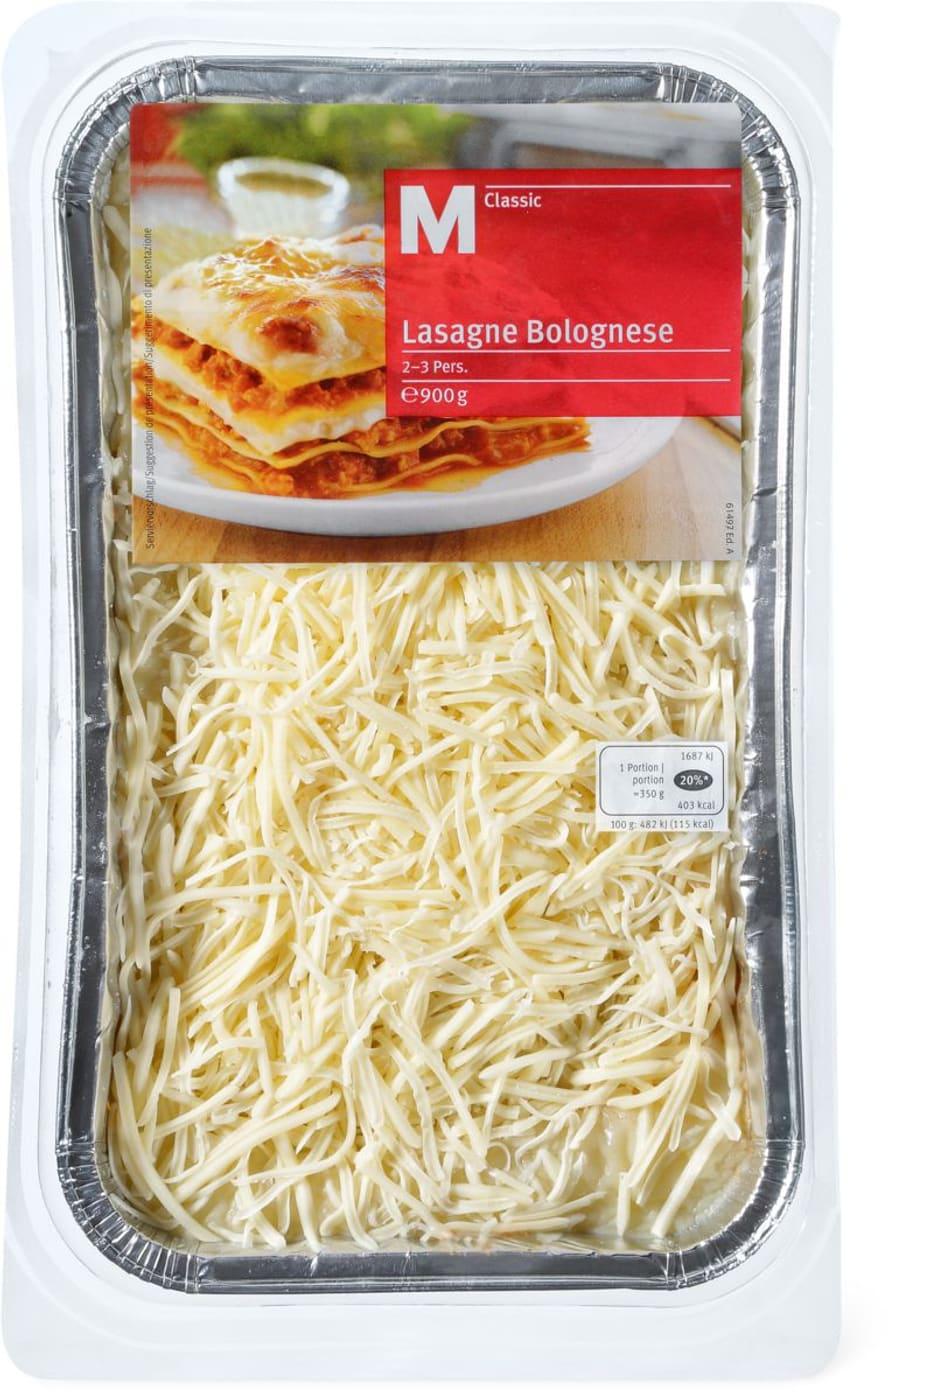 Classic Lasagne M Classic Lasagne Bolognese Migros